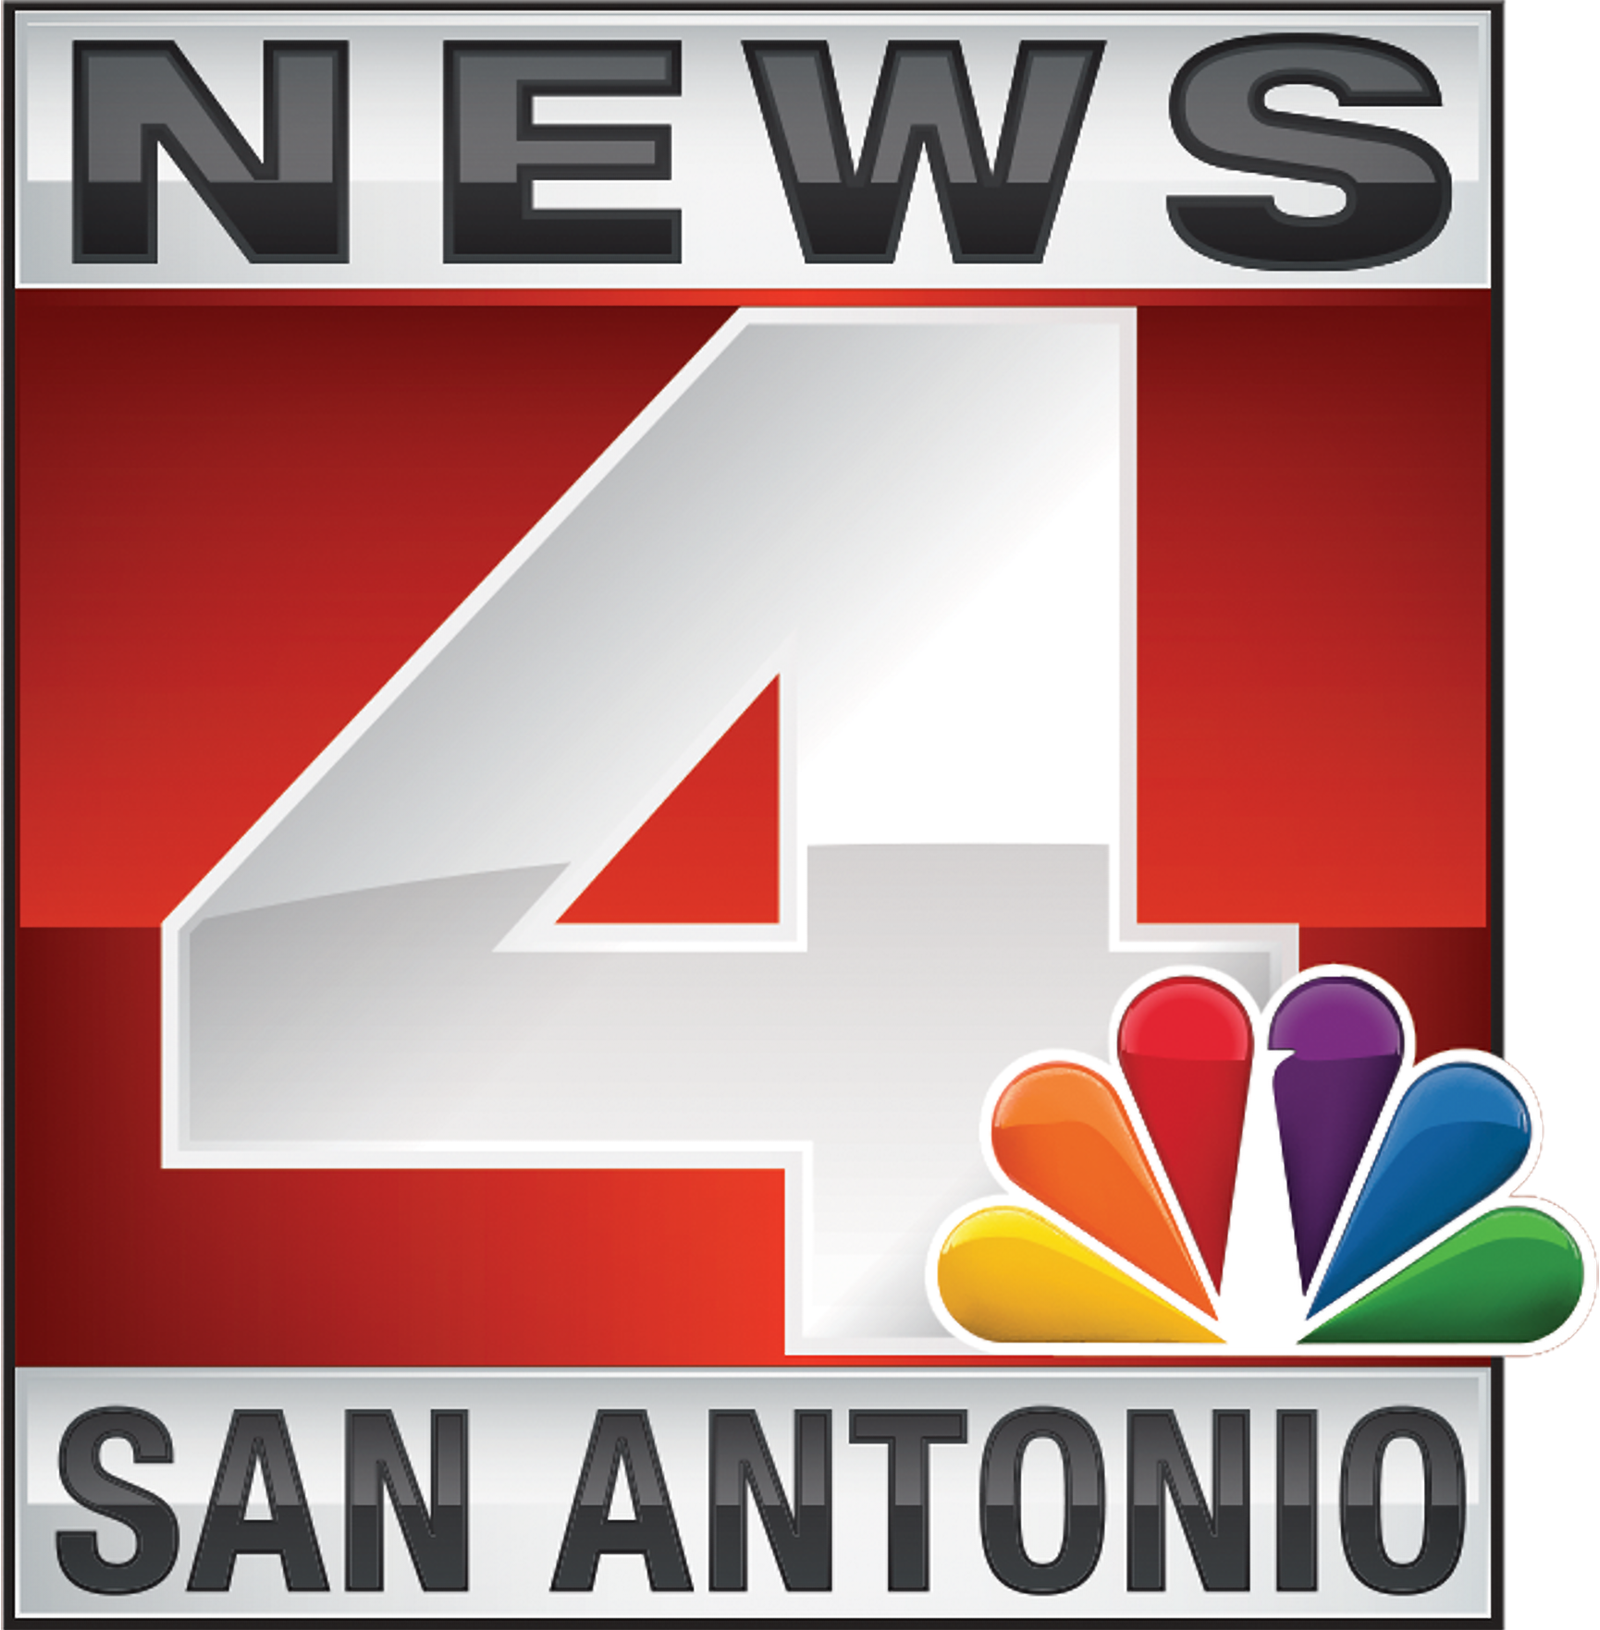 WOAI News 4 San Antonio logo